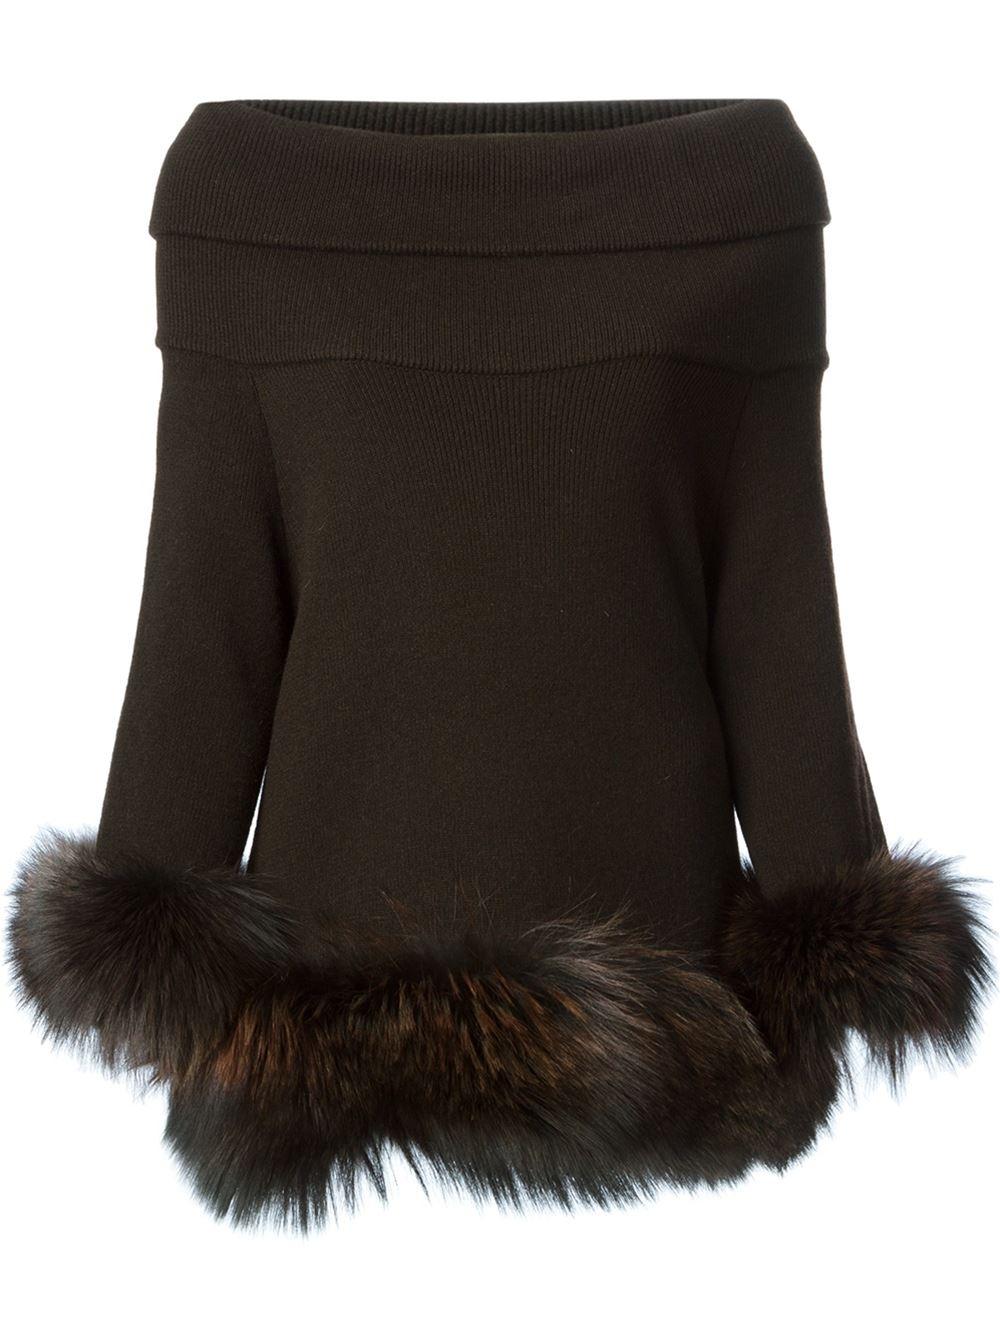 Vicedomini Fox Fur Hem And Cuffs Sweater in Brown | Lyst